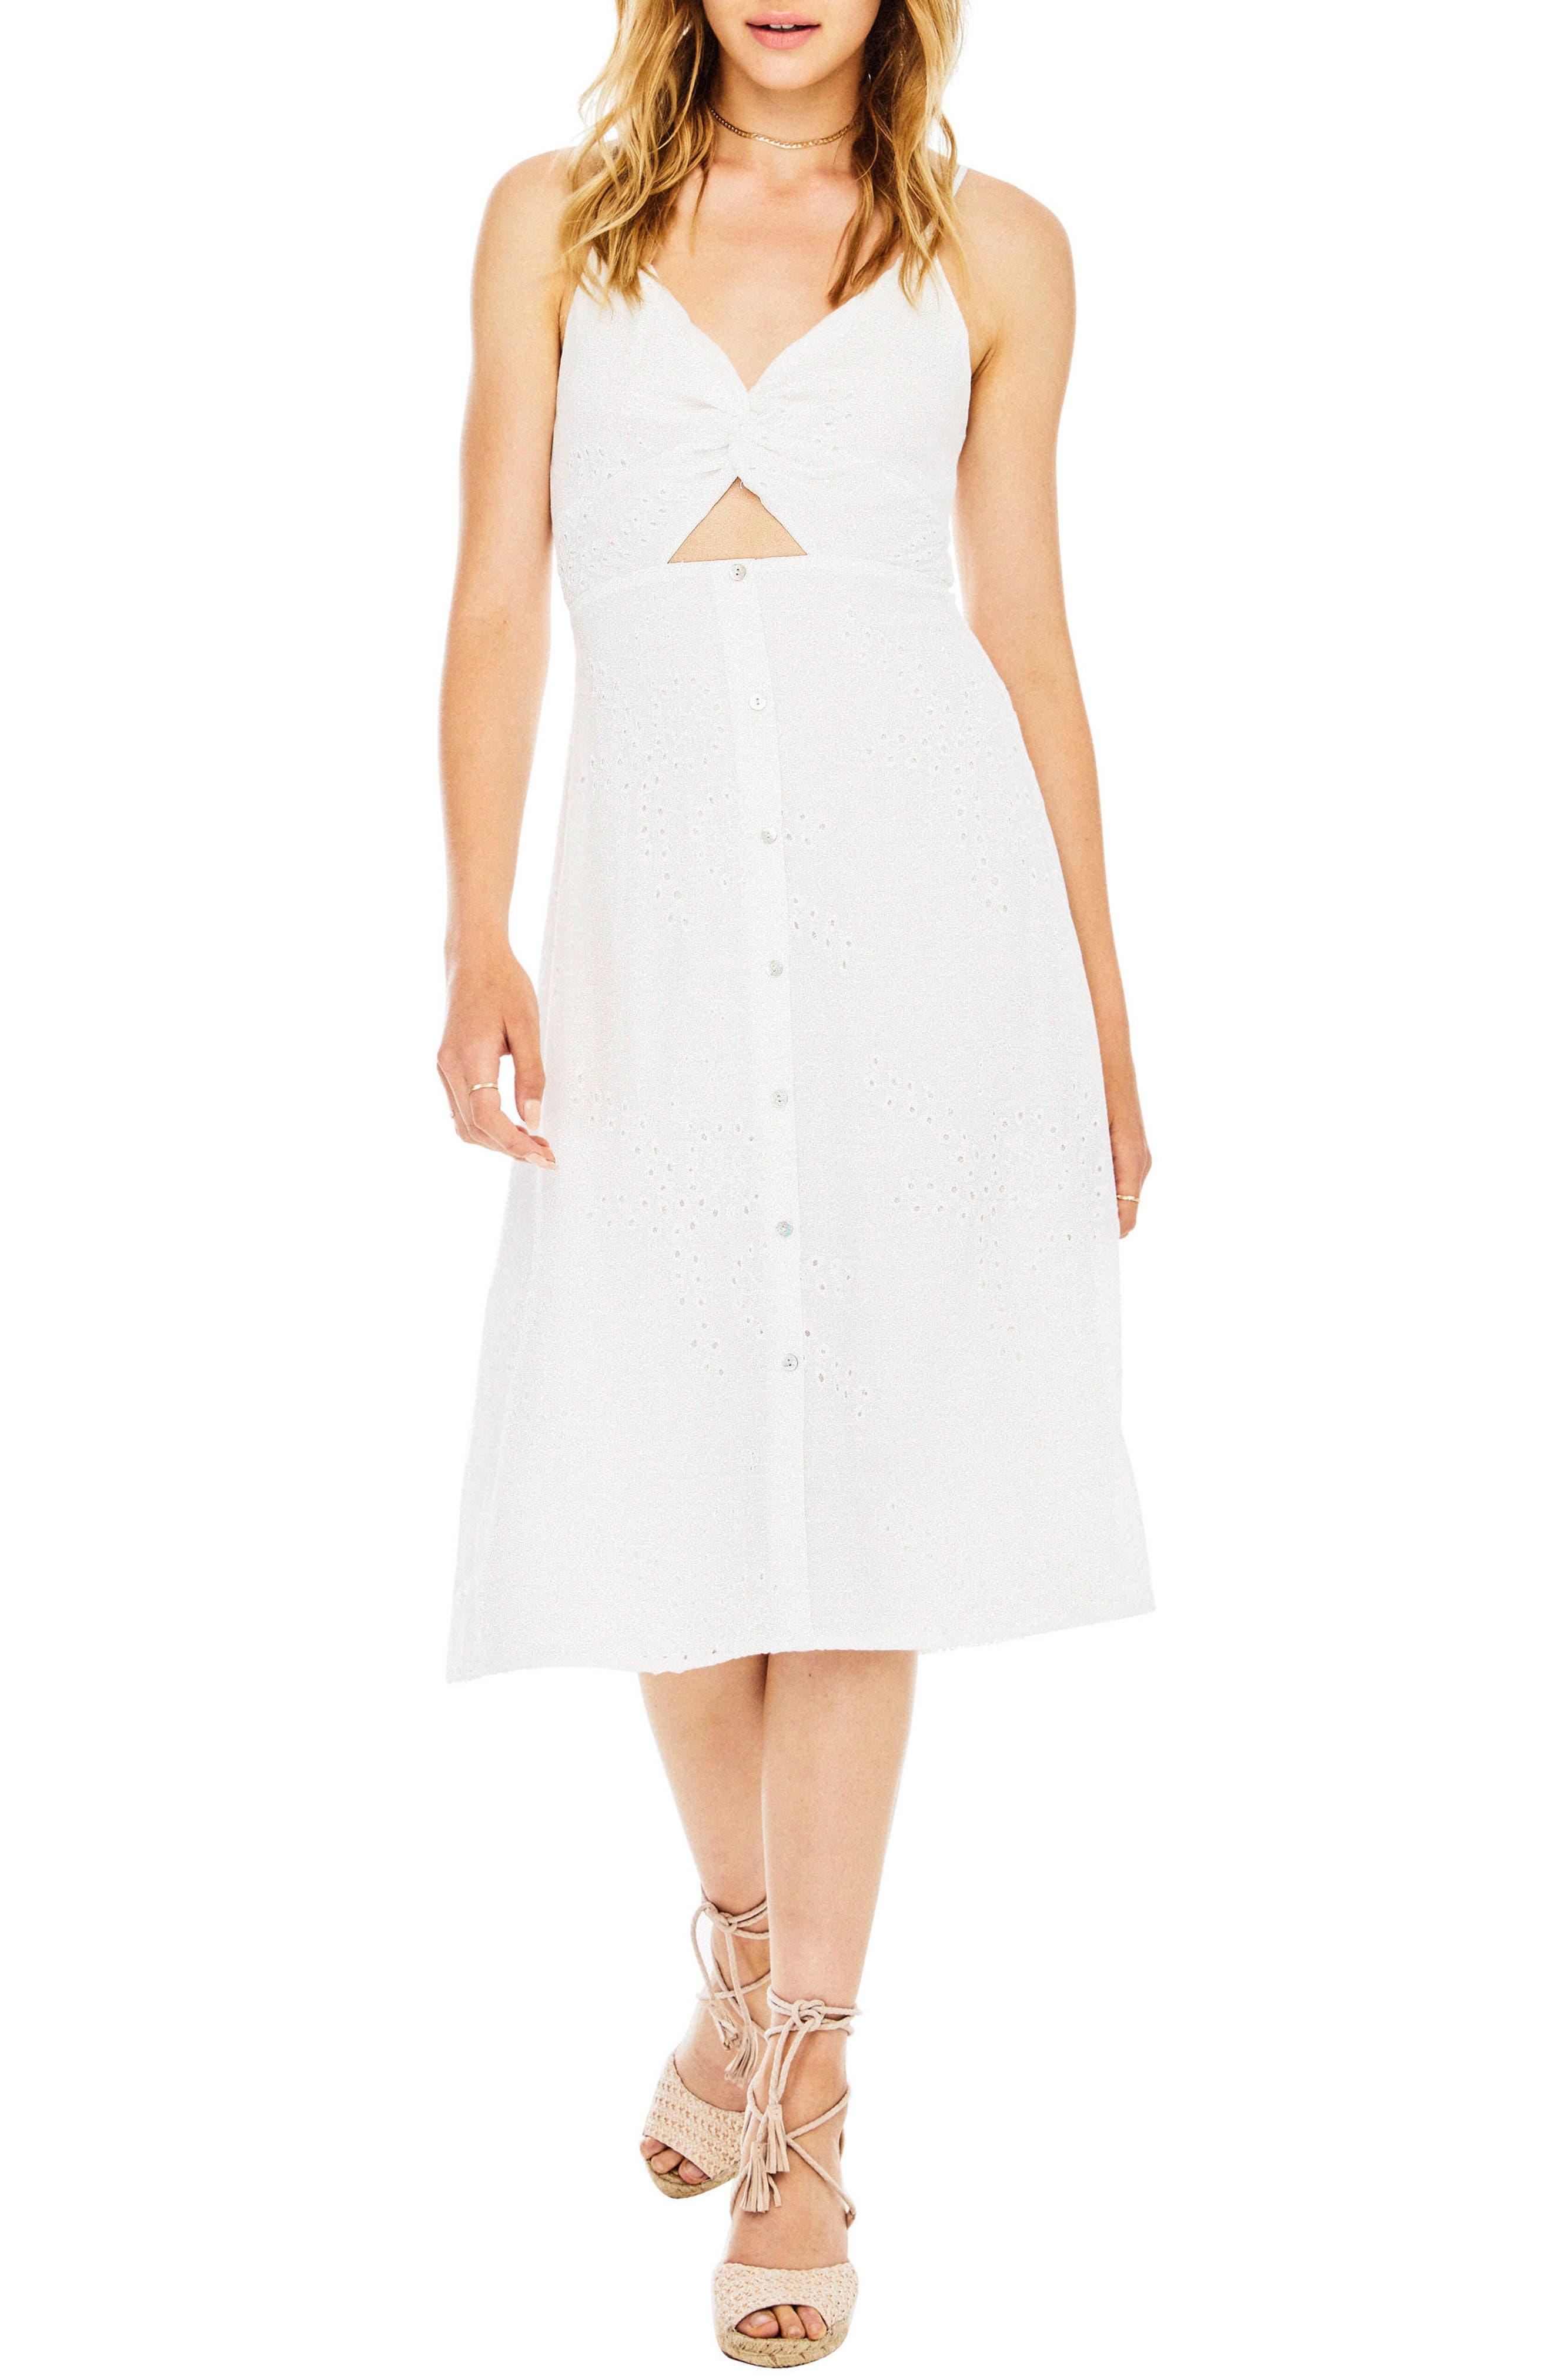 Ellowyn Dress,                         Main,                         color, White